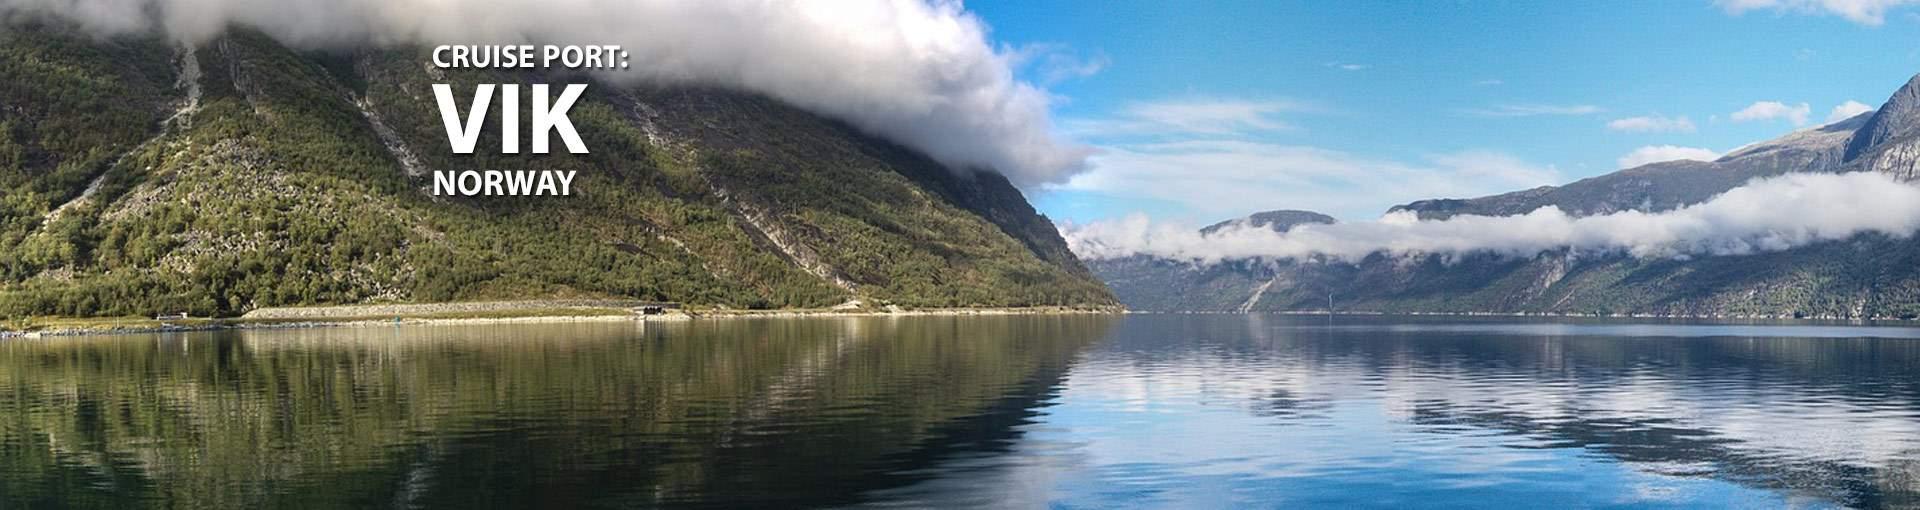 Vik, Norway Cruise Port